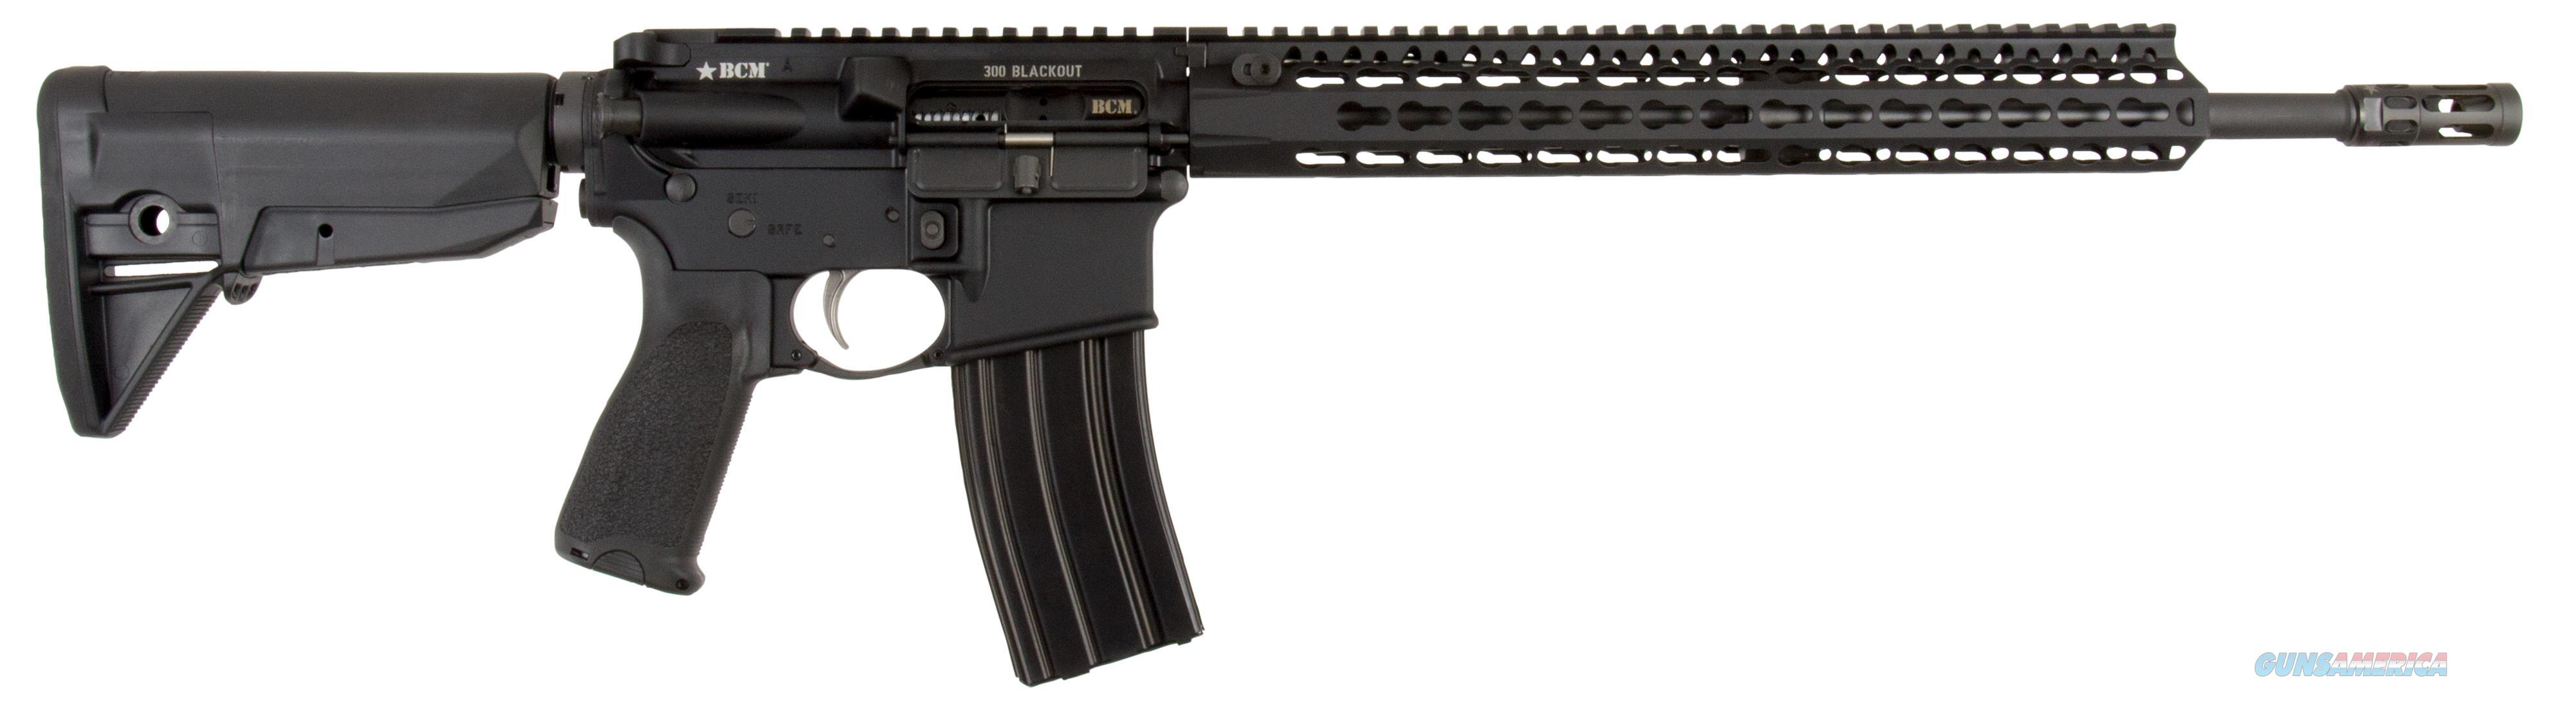 "Bravo 653-790 Bcm Recce-16 Semi-Automatic 300 Aac Blackout/Whisper (7.62X35mm) 16"" 6-Position Stk Blk 653-790  Guns > Rifles > B Misc Rifles"